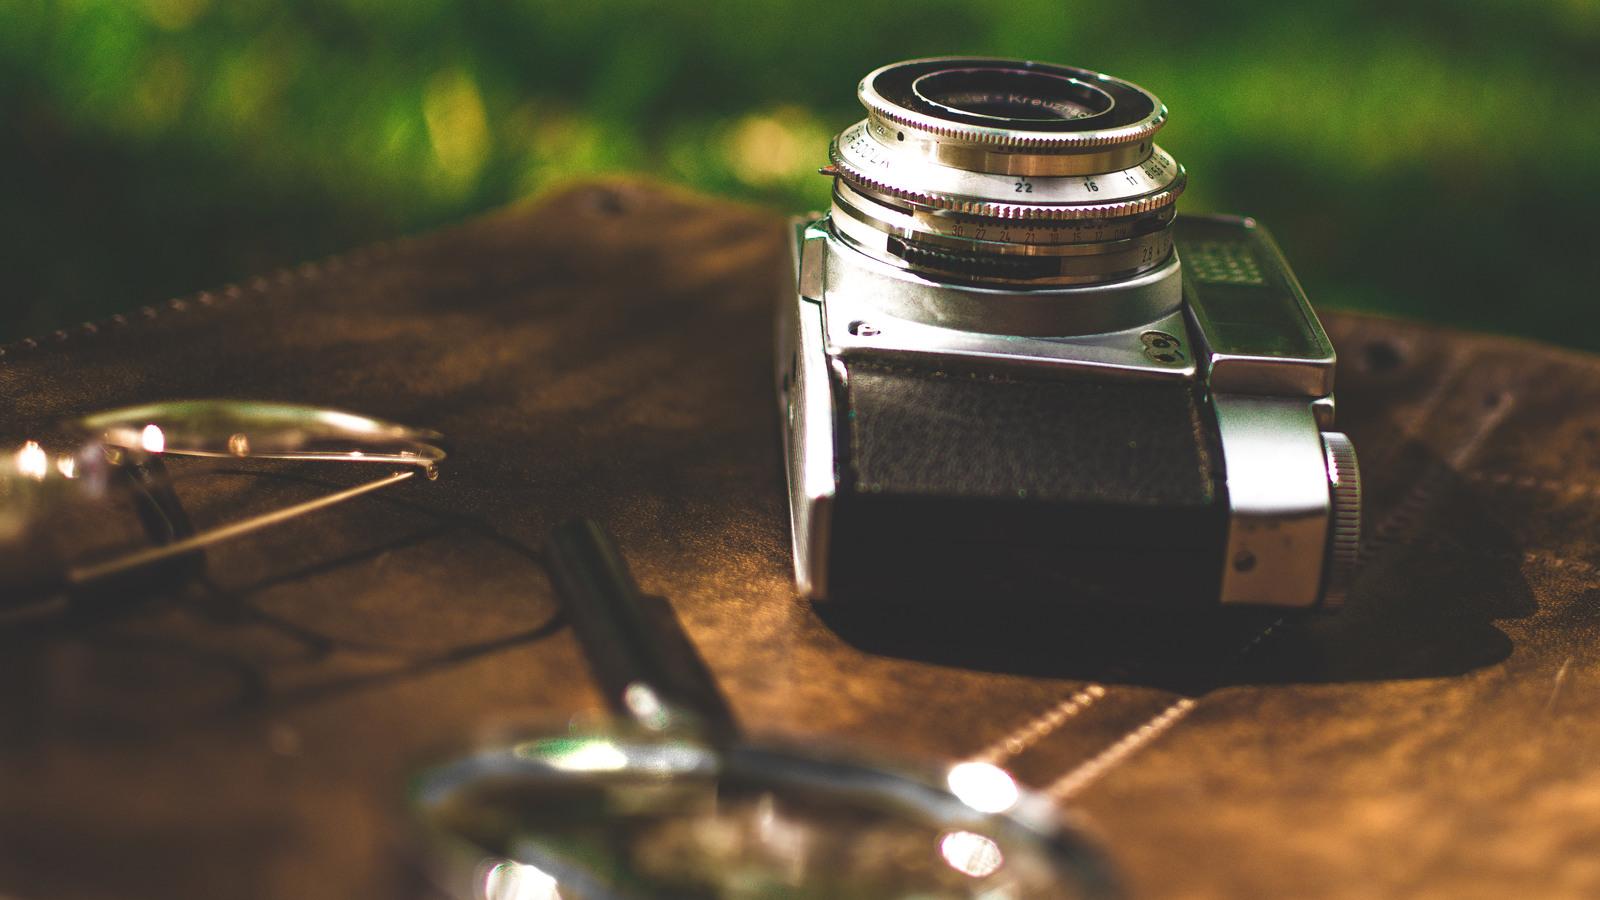 retro-old-camera-magnifying-glass-sh.jpg